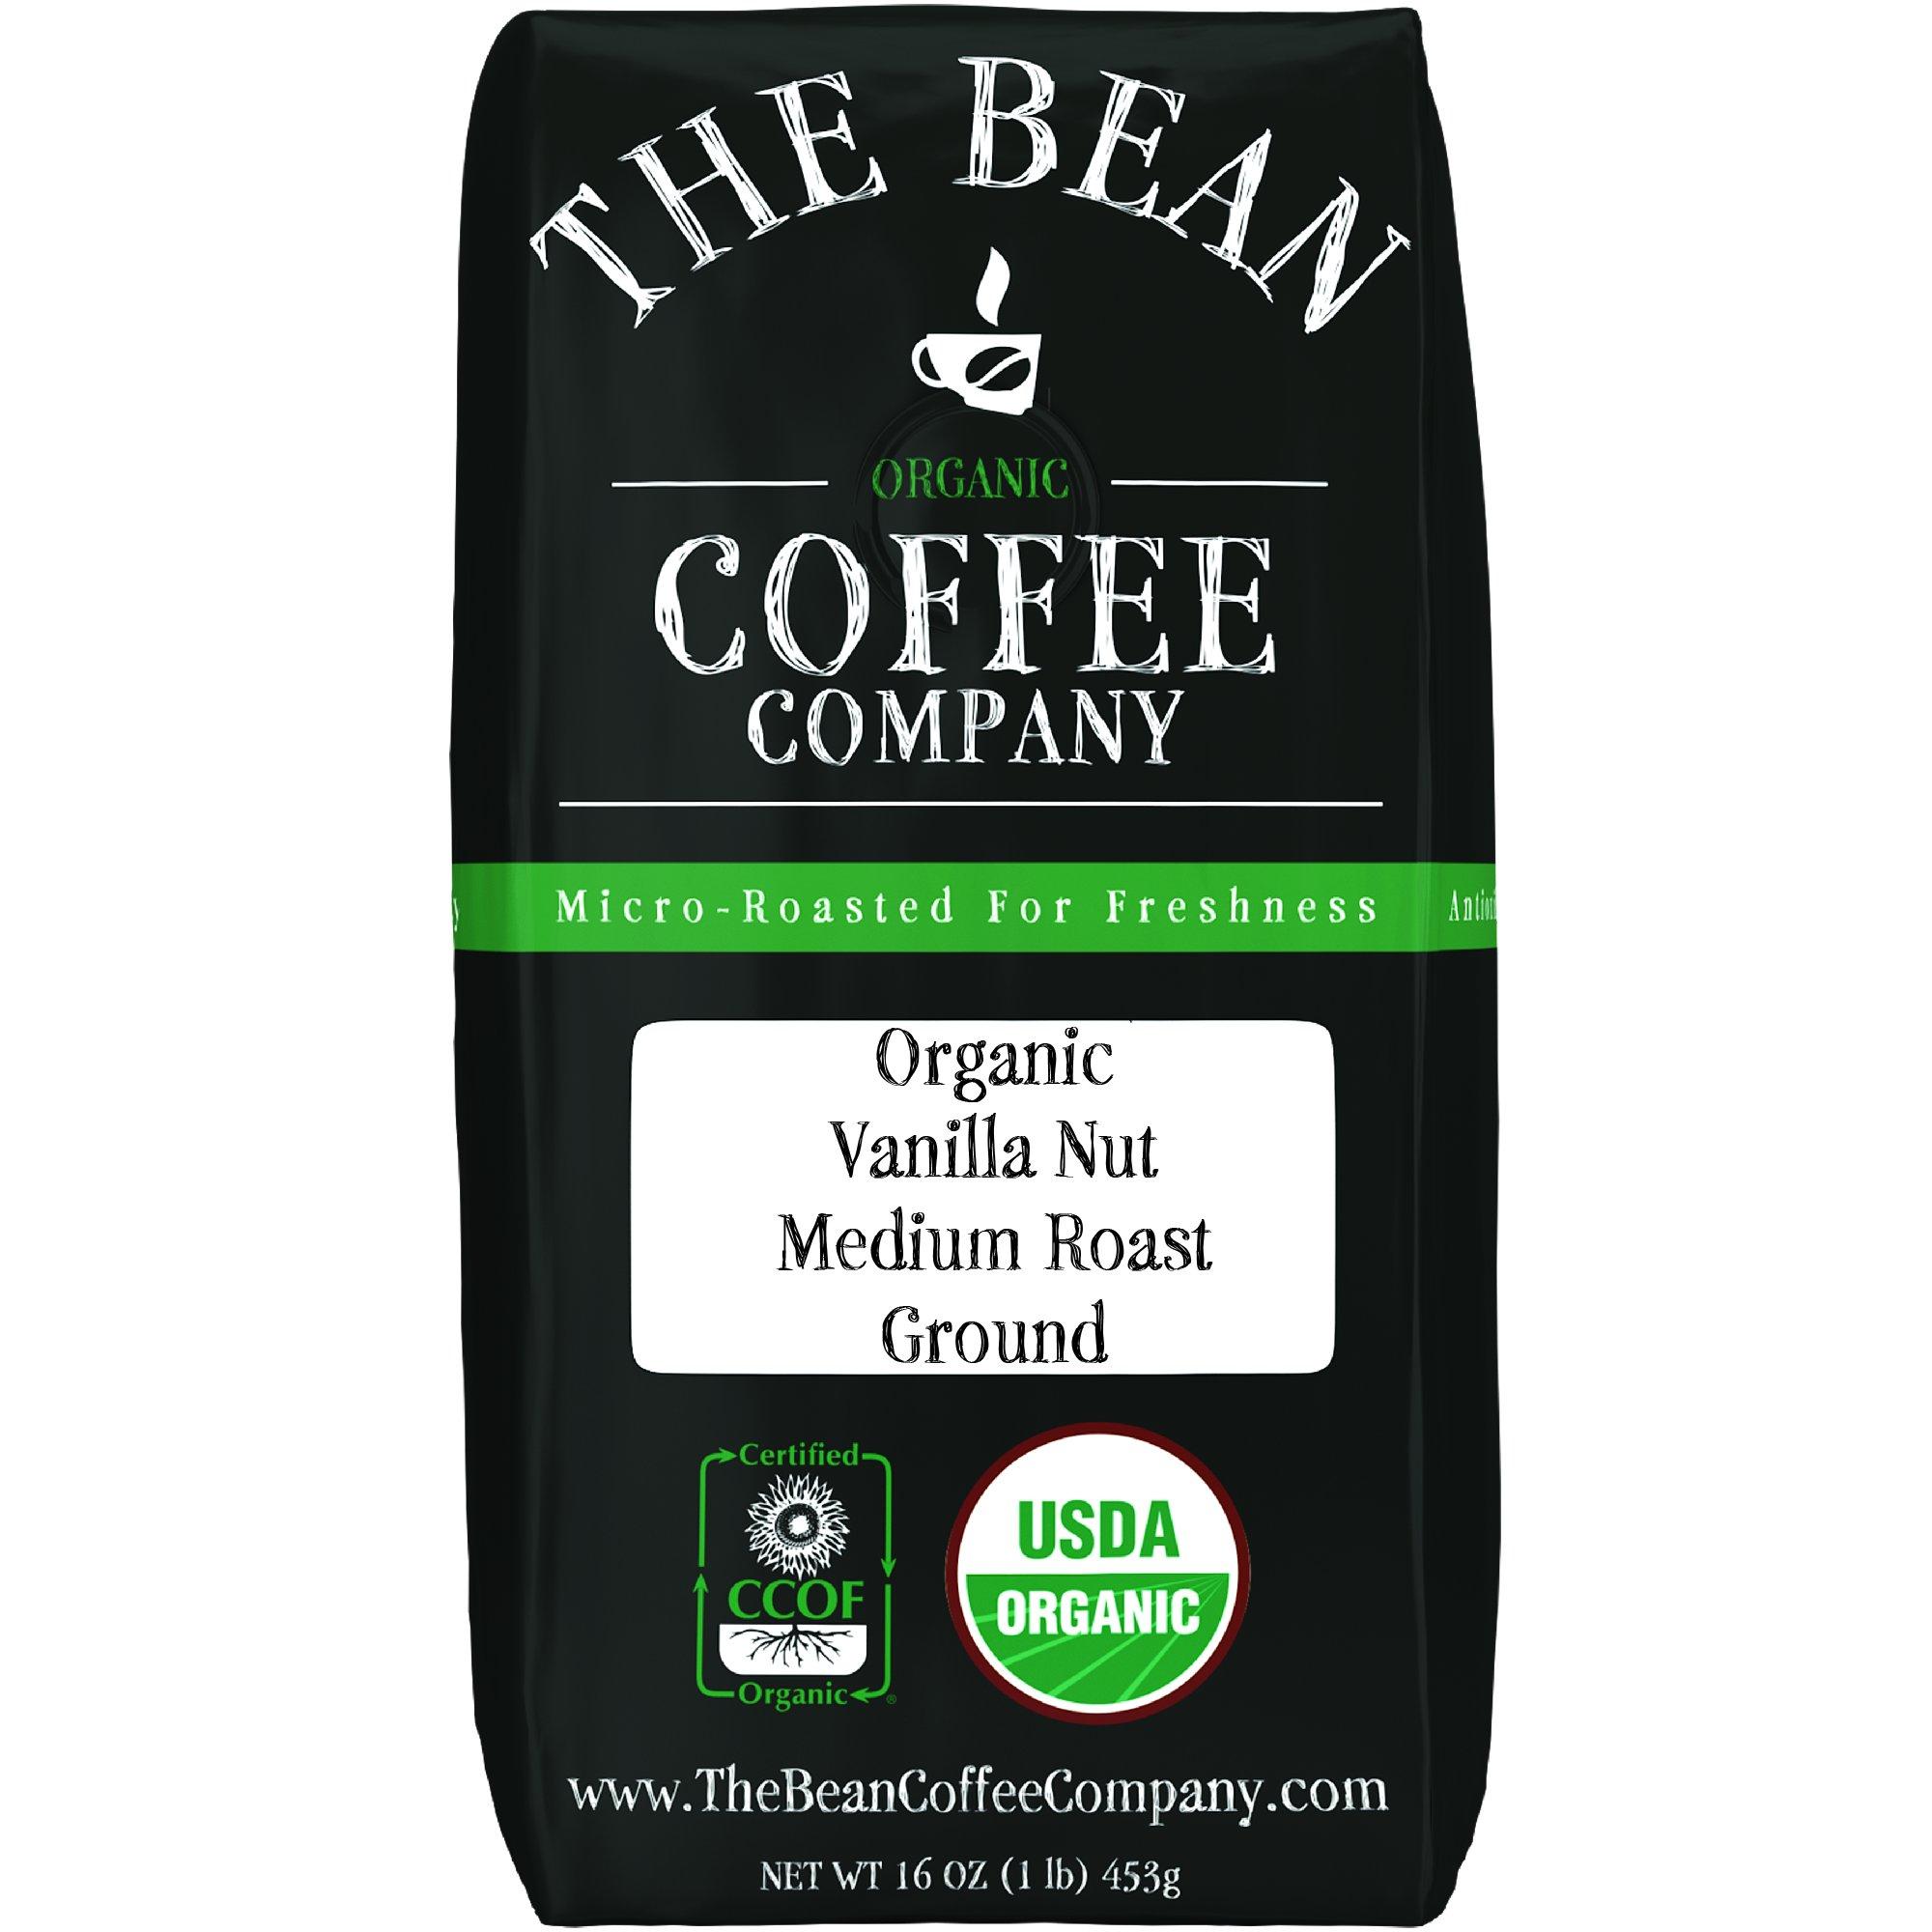 The Bean Coffee Company Organic Vanilla Nut, Medium Roast, Ground, 16-Ounce Bag by The Bean Coffee Company